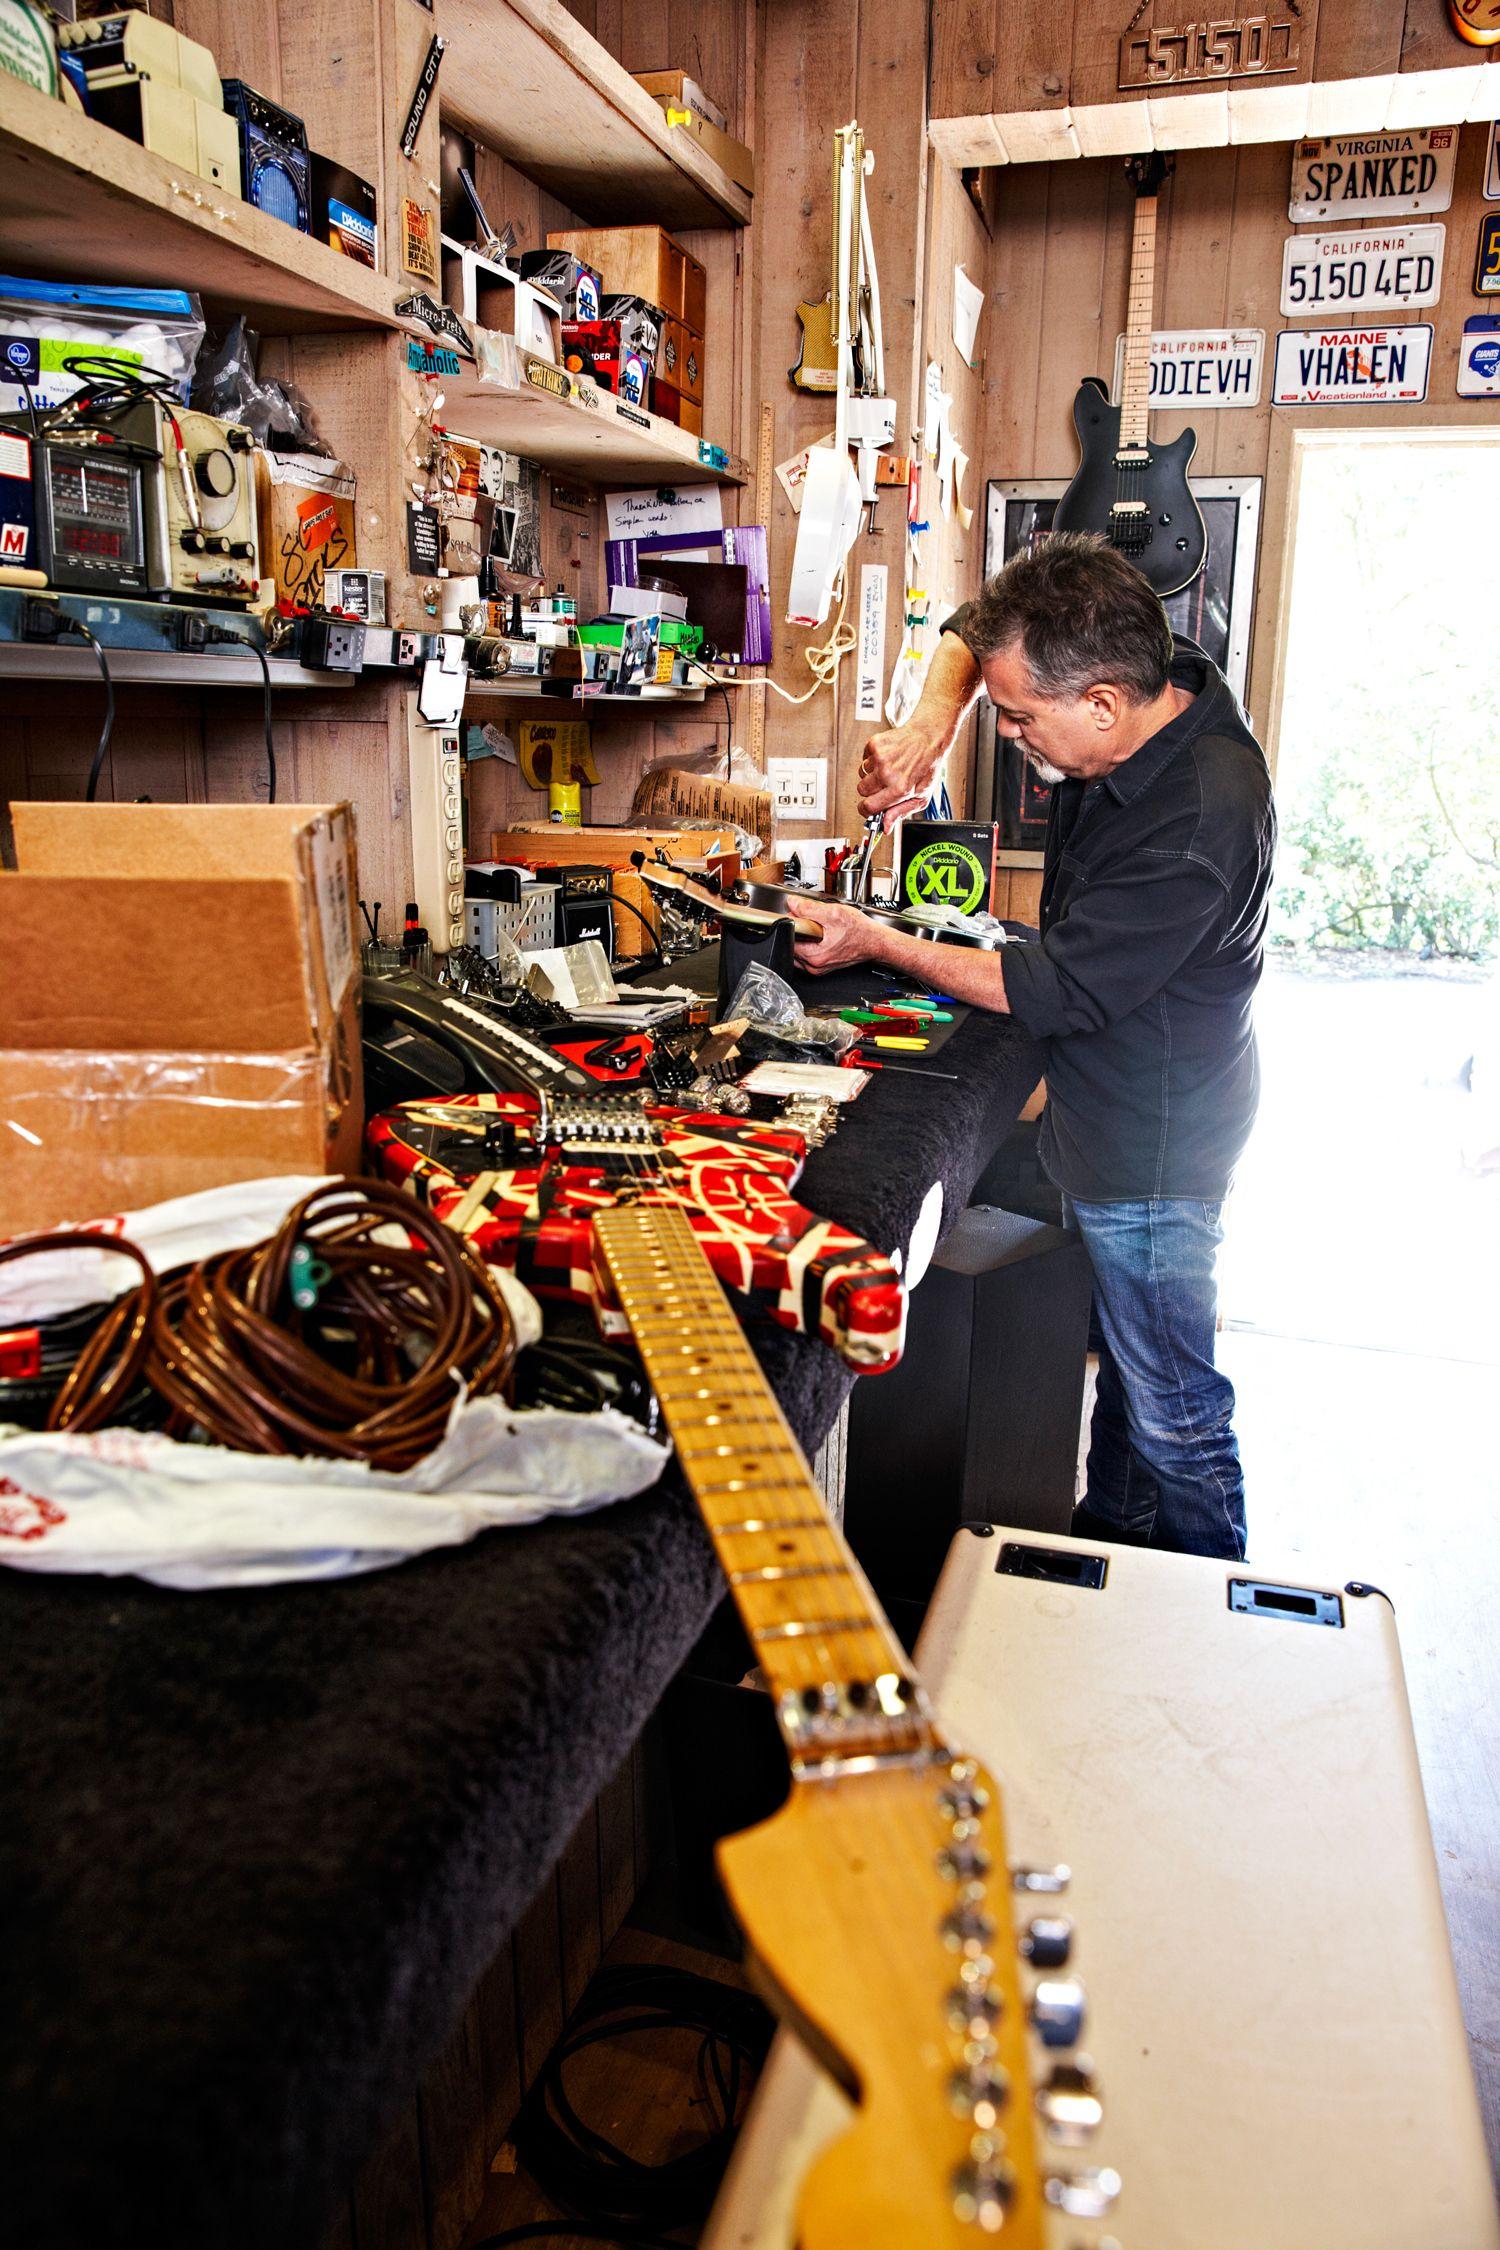 Evh Pickup Wiring Diagram Detailed Diagrams Tom Anderson Eddie Van Halen Another Blog About Dodge